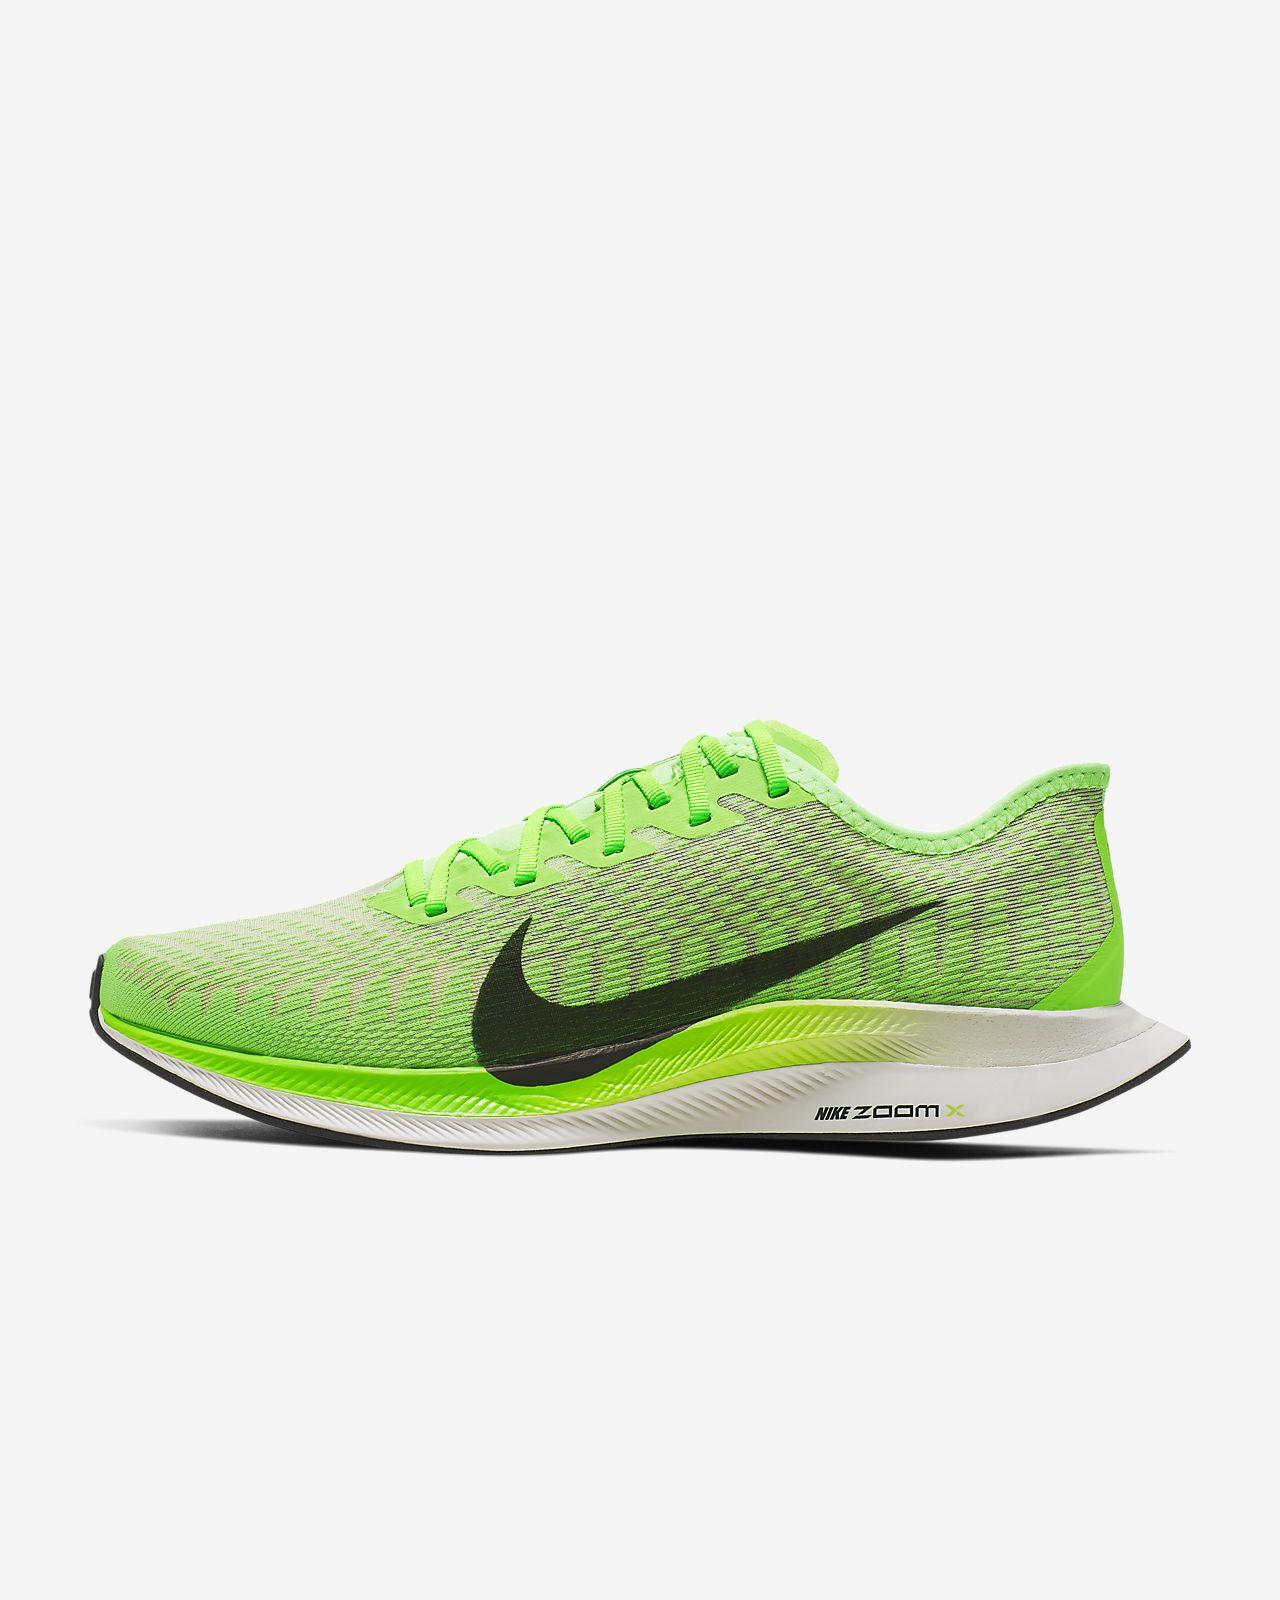 code promo 6185f 3f280 Nike Zoom Pegasus Turbo 2 Men's Running Shoe